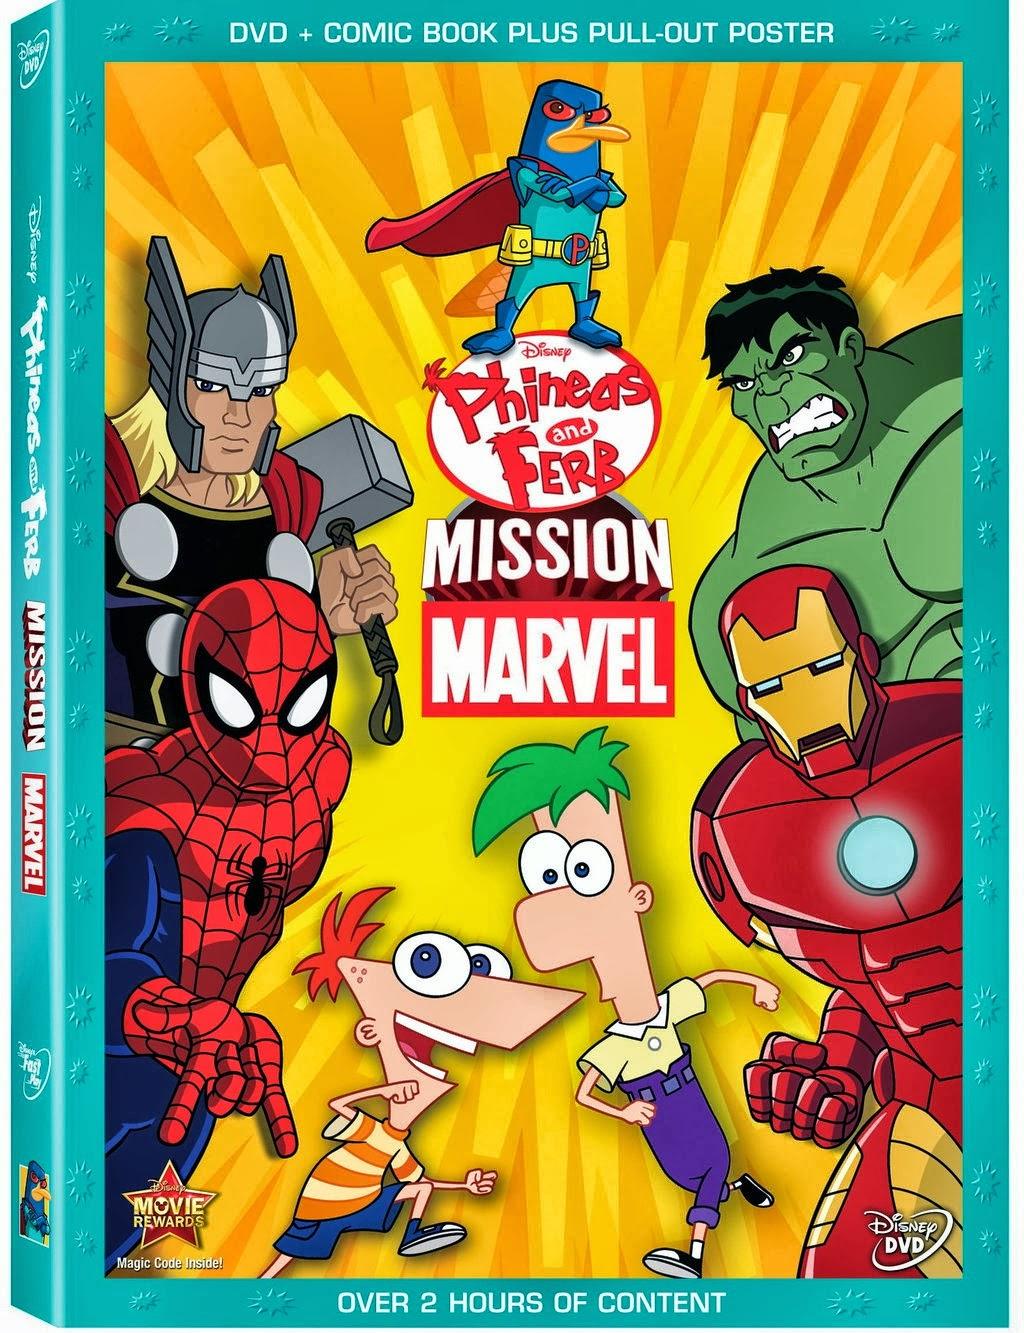 phineas y ferb mision marvel 2013 espanol latino dvdrip Phineas y Ferb: Misión Marvel (2013) Español Latino DVDRip